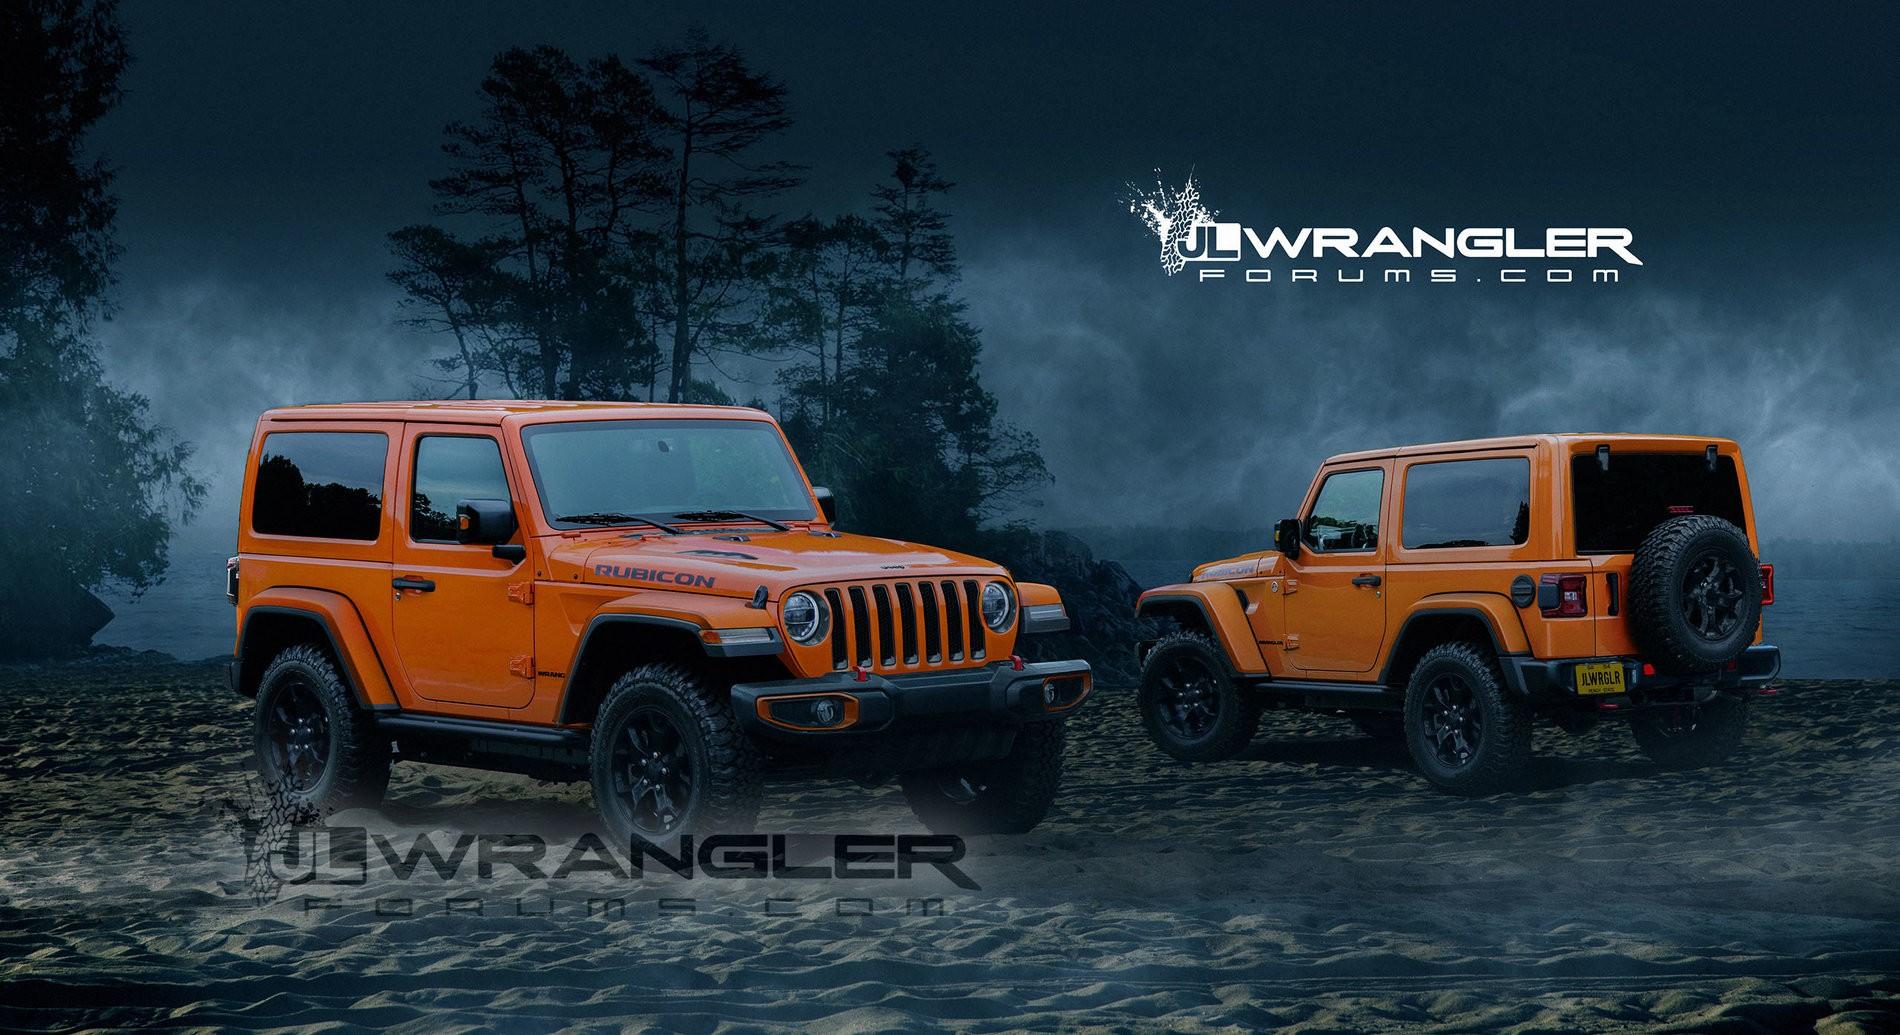 Meet Usher's New Custom Made Jeep Wrangler Rubicon ...